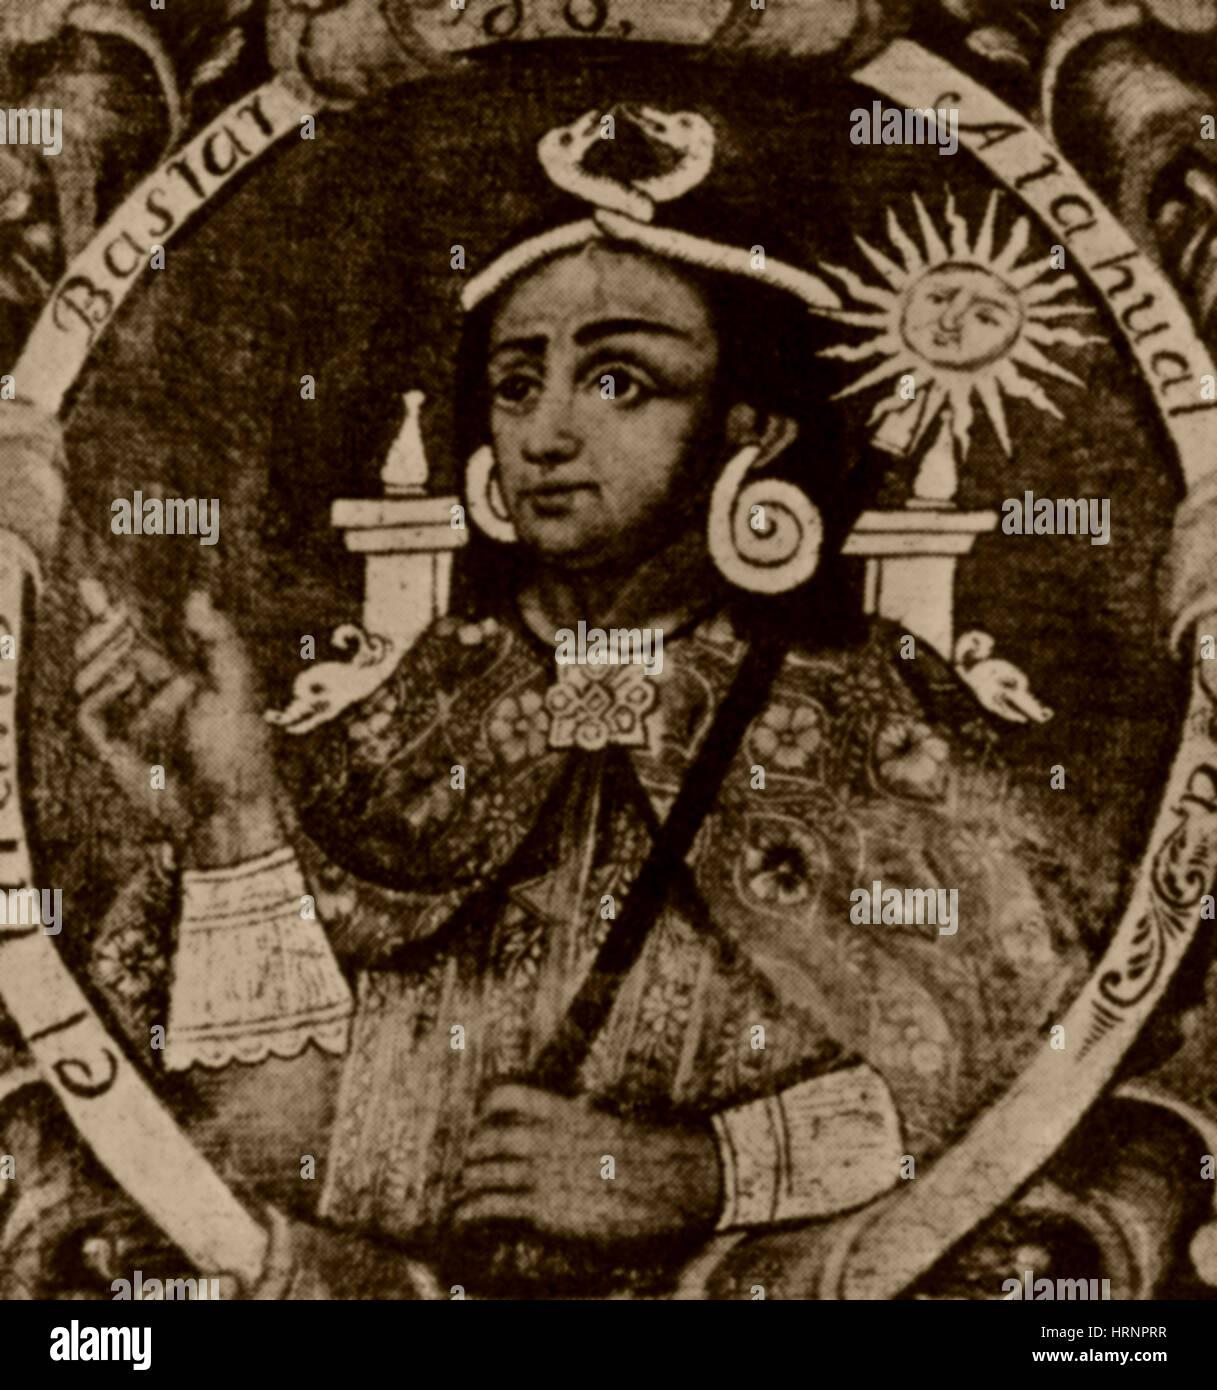 Atahualpa, Last Emperor of the Incan Empire - Stock Image